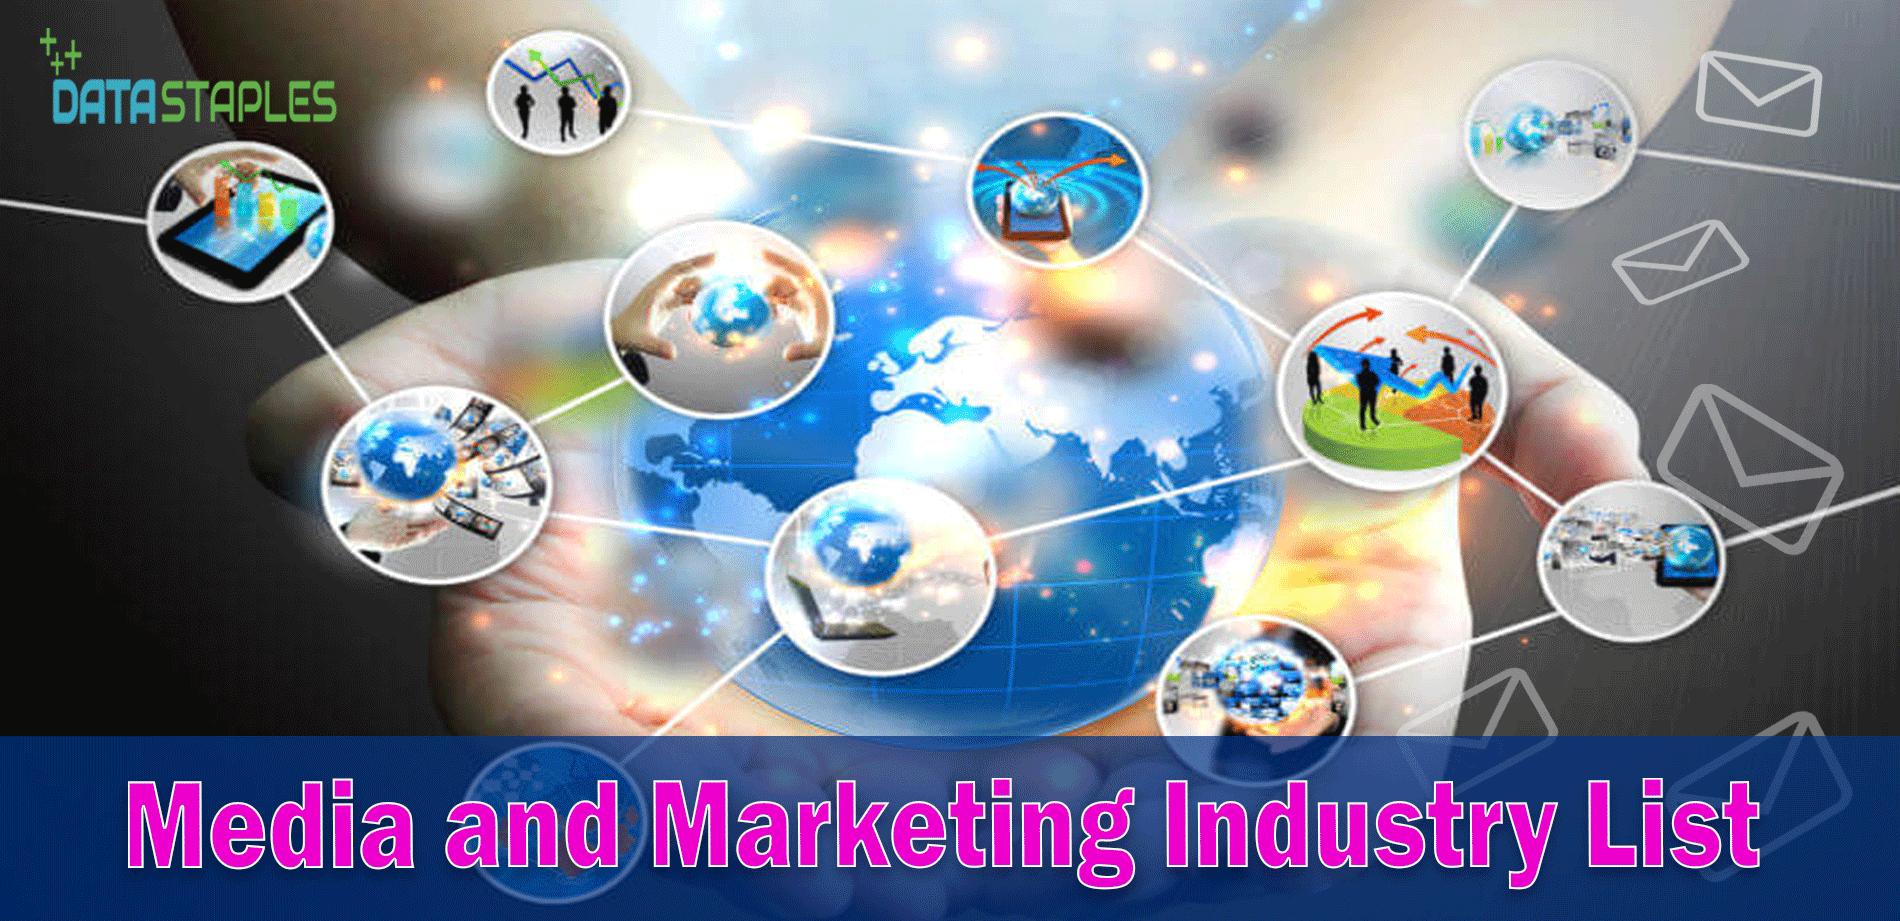 Media and Marketing Industry List | DataStaples